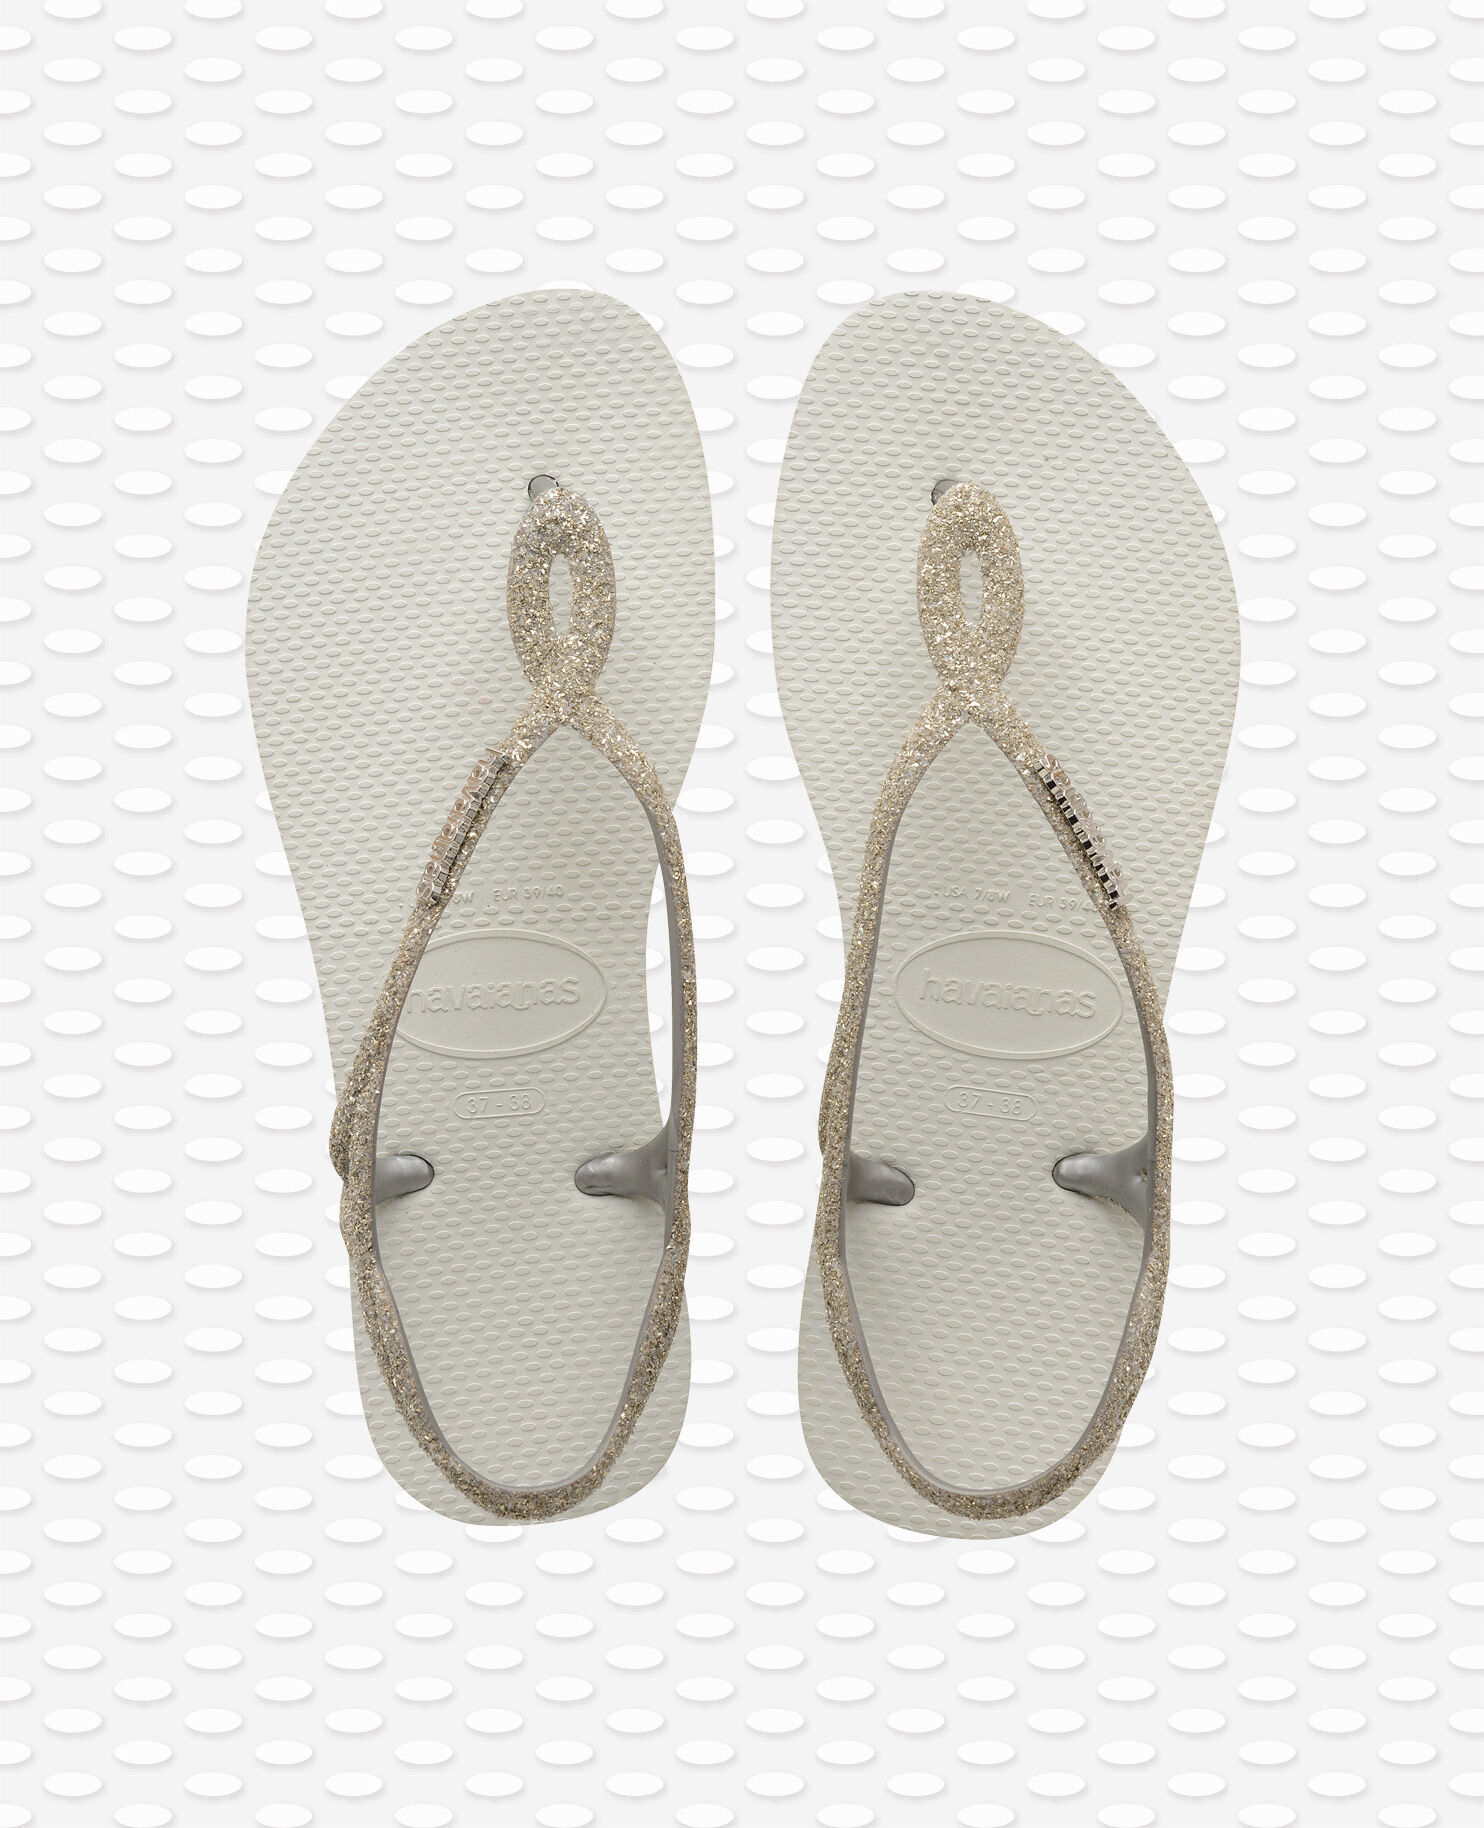 Havaianas Womens Luna Special Flip Flops Black Sandal